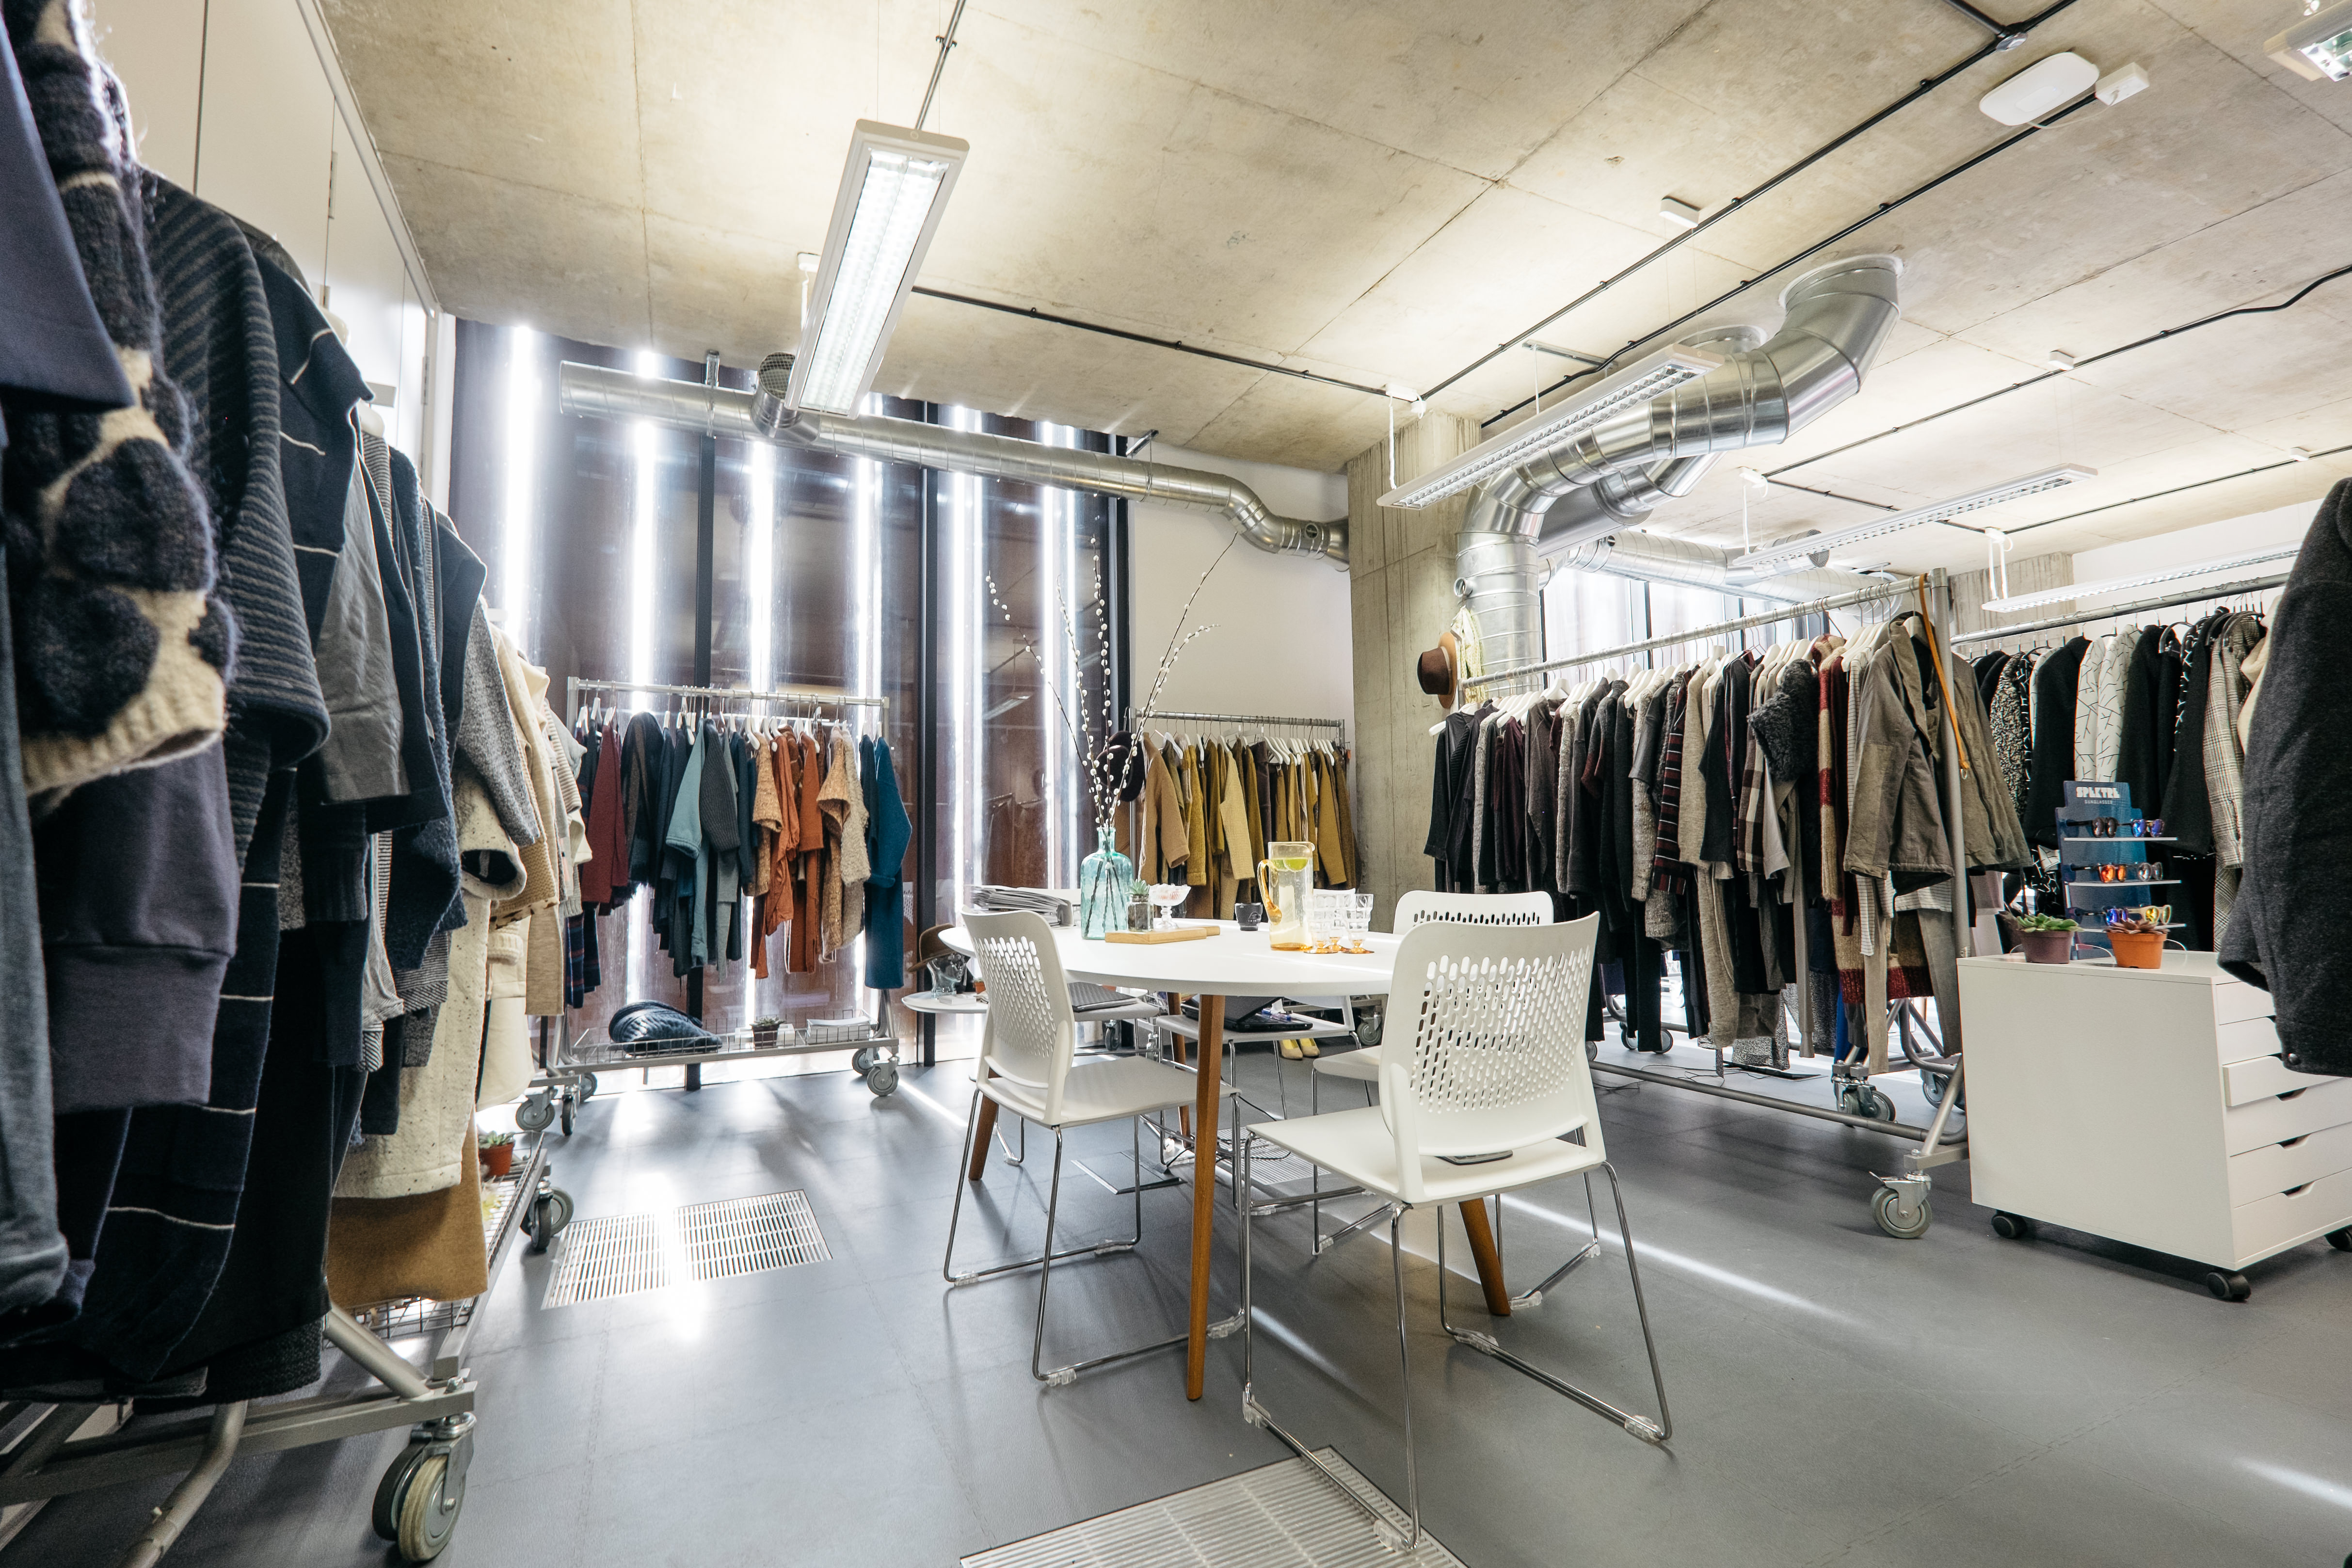 The campus British School of Fashion at GCU Londons Visual